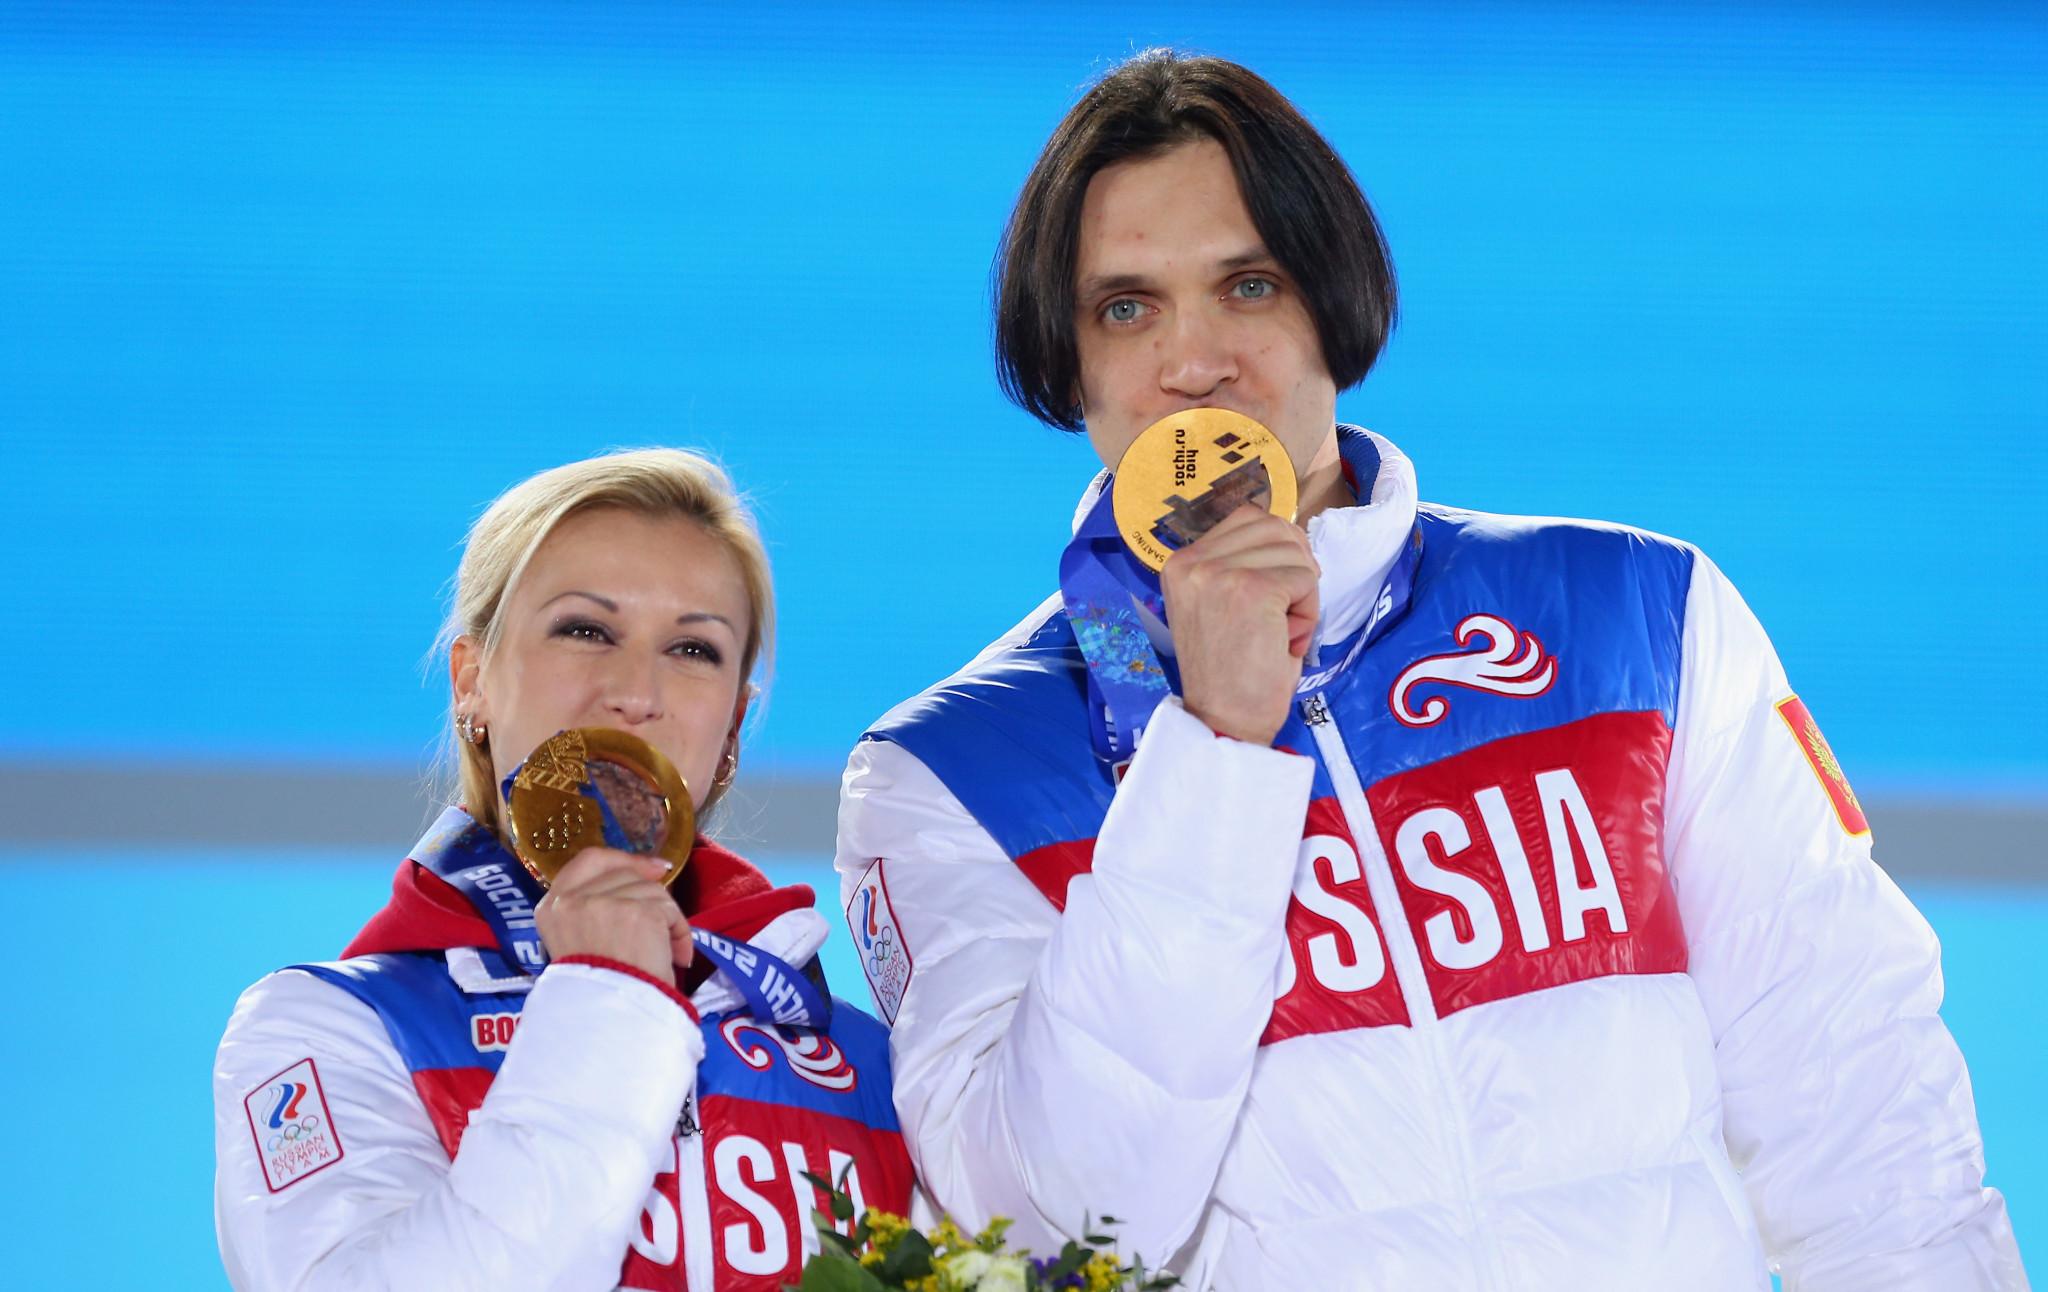 Tatiana Volosozhar won Olympic pairs gold with Maxim Trankov ©Getty Images